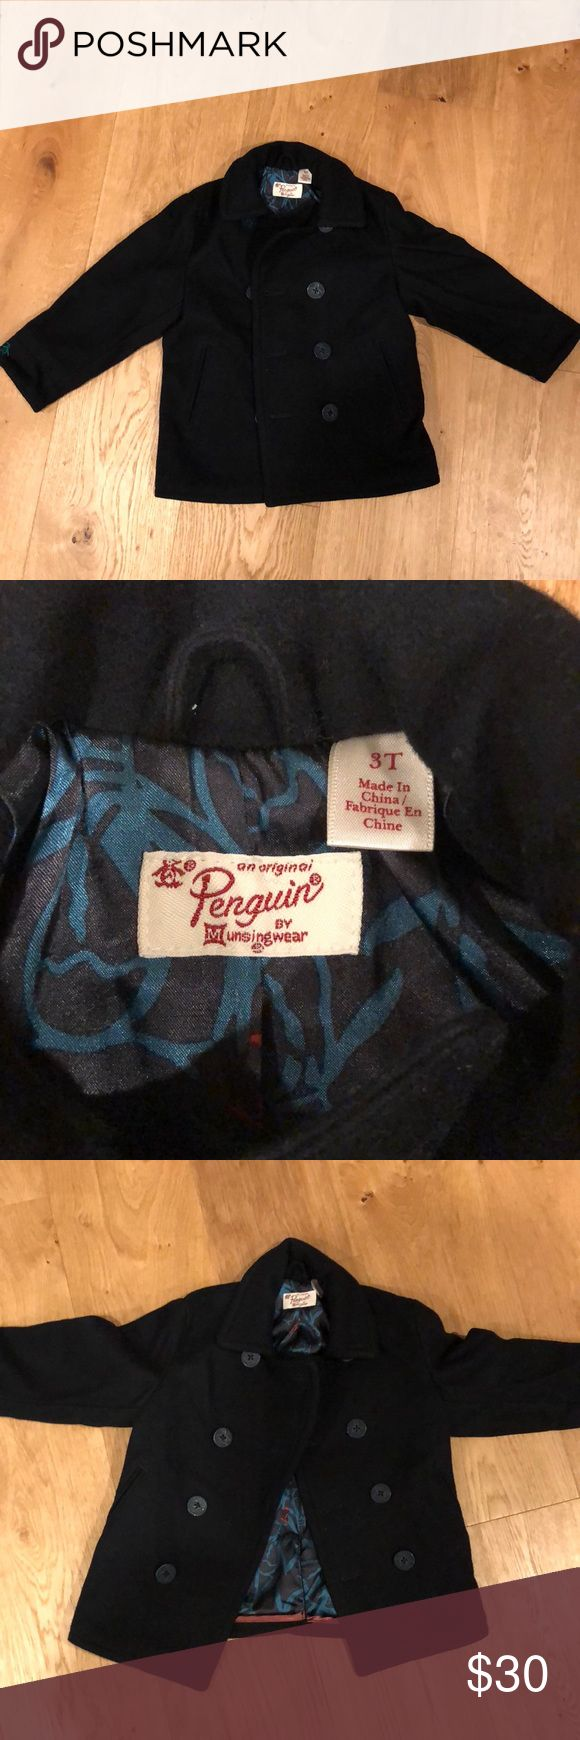 Penguin brand Toddler pea coat Penguin Toddler Pea coat // Brand New, no tags Original Penguin Jackets & Coats Pea Coats